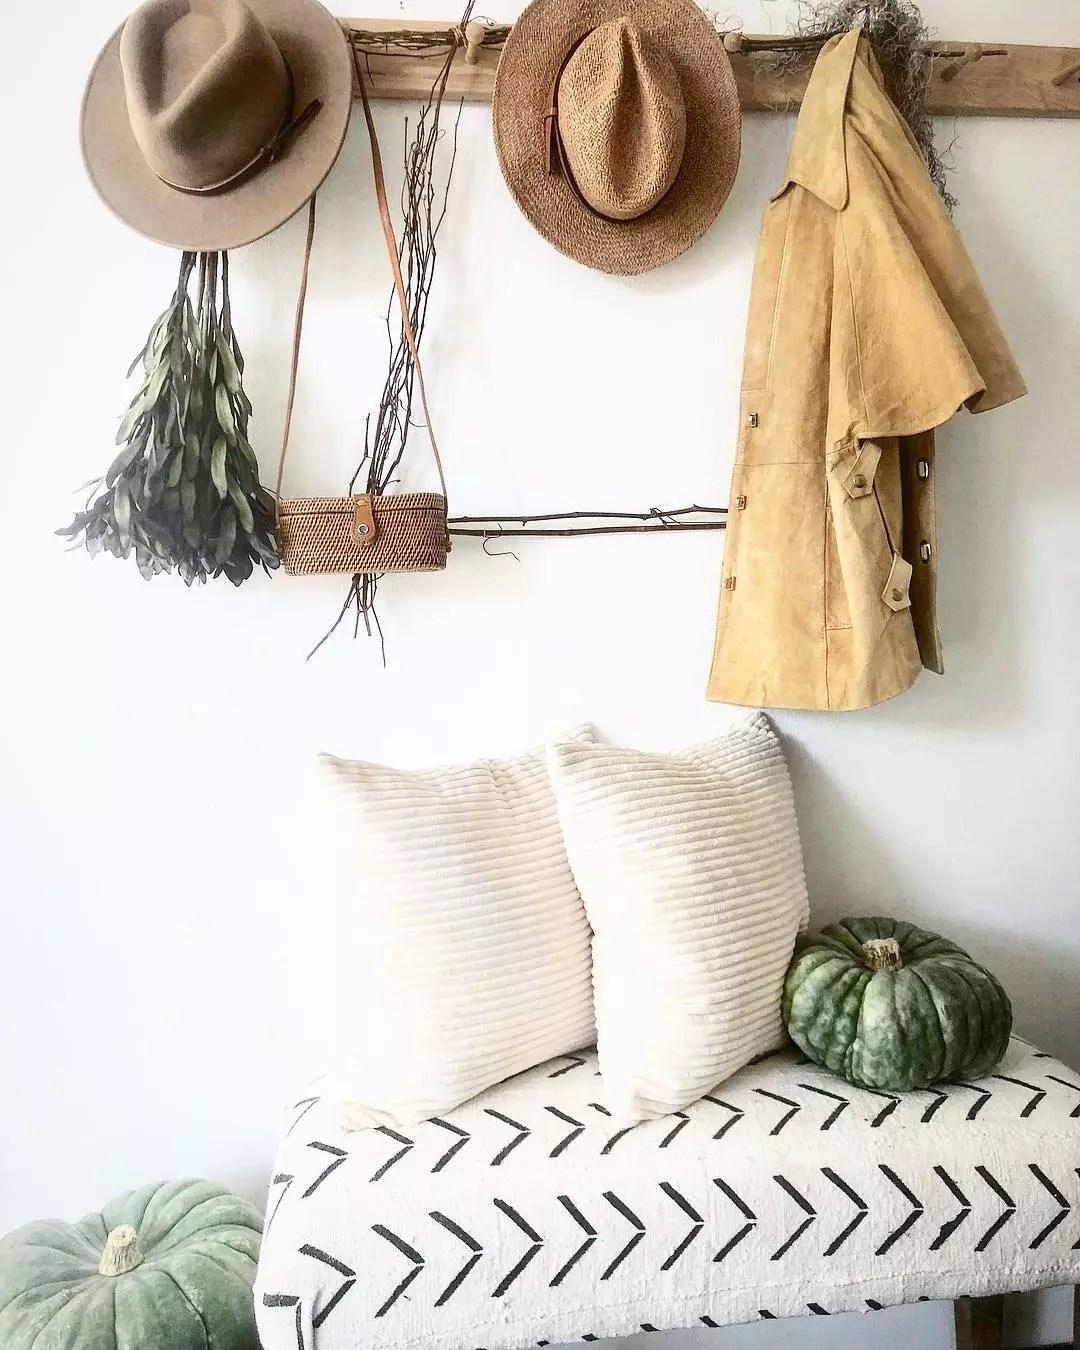 Fall decor. Photo by Instagram user @shopthreesparrows